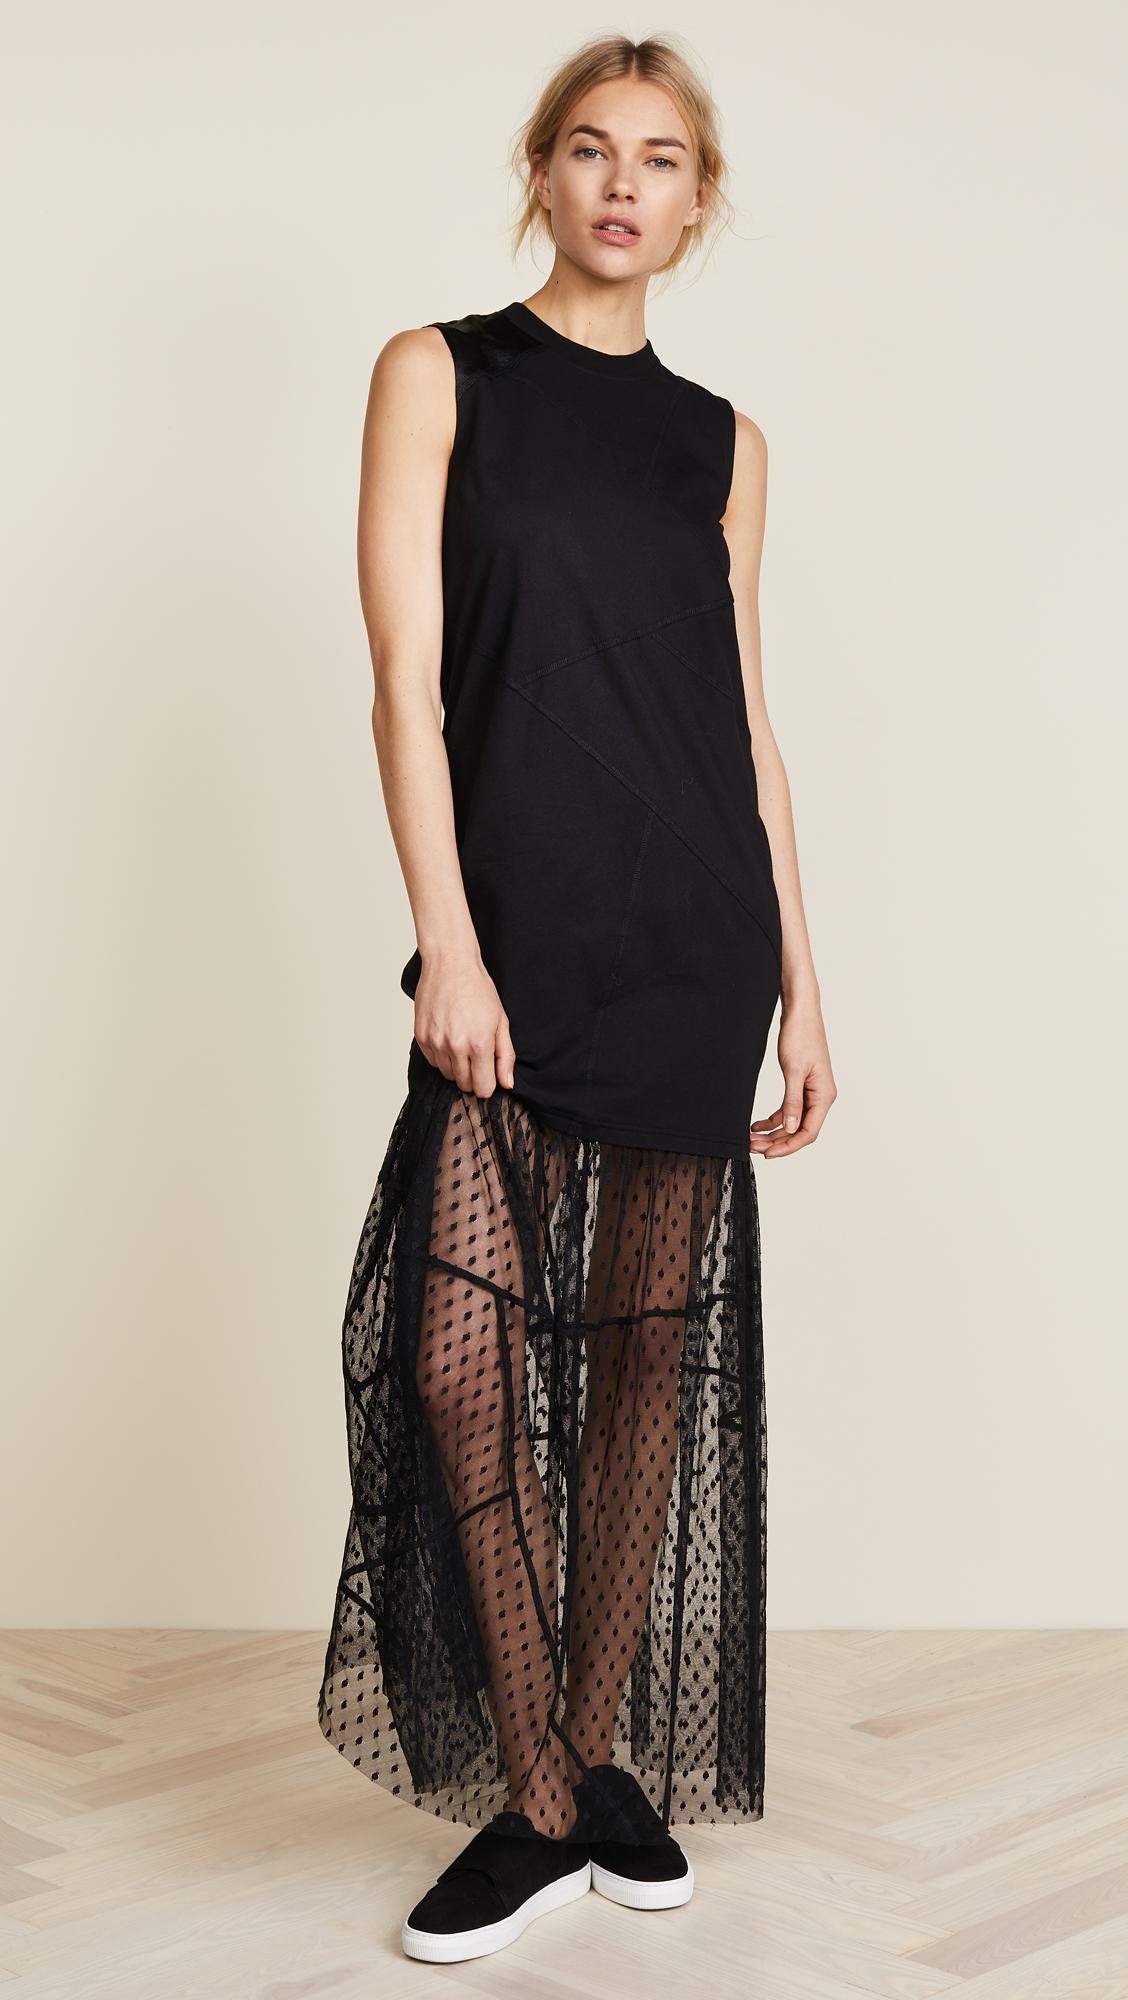 McQ Cut Up Hybrid Dress - Weekly Finds by popular North Carolina style blogger Glitter, Inc.